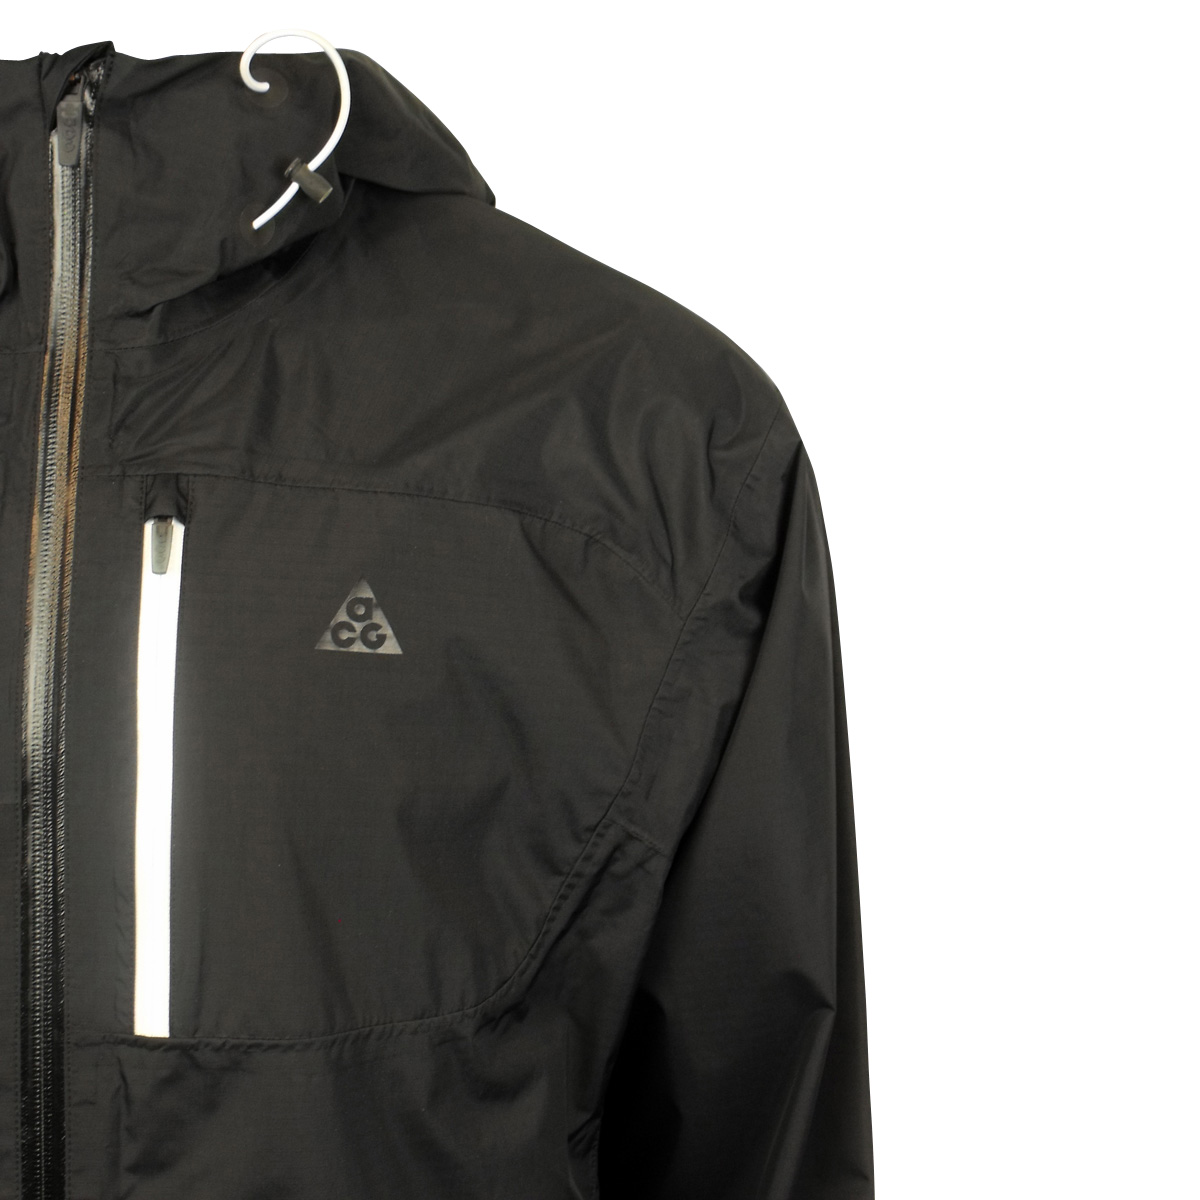 nike shoes acg storm with zipper Vintage Nike Jacket ... 5d730716b